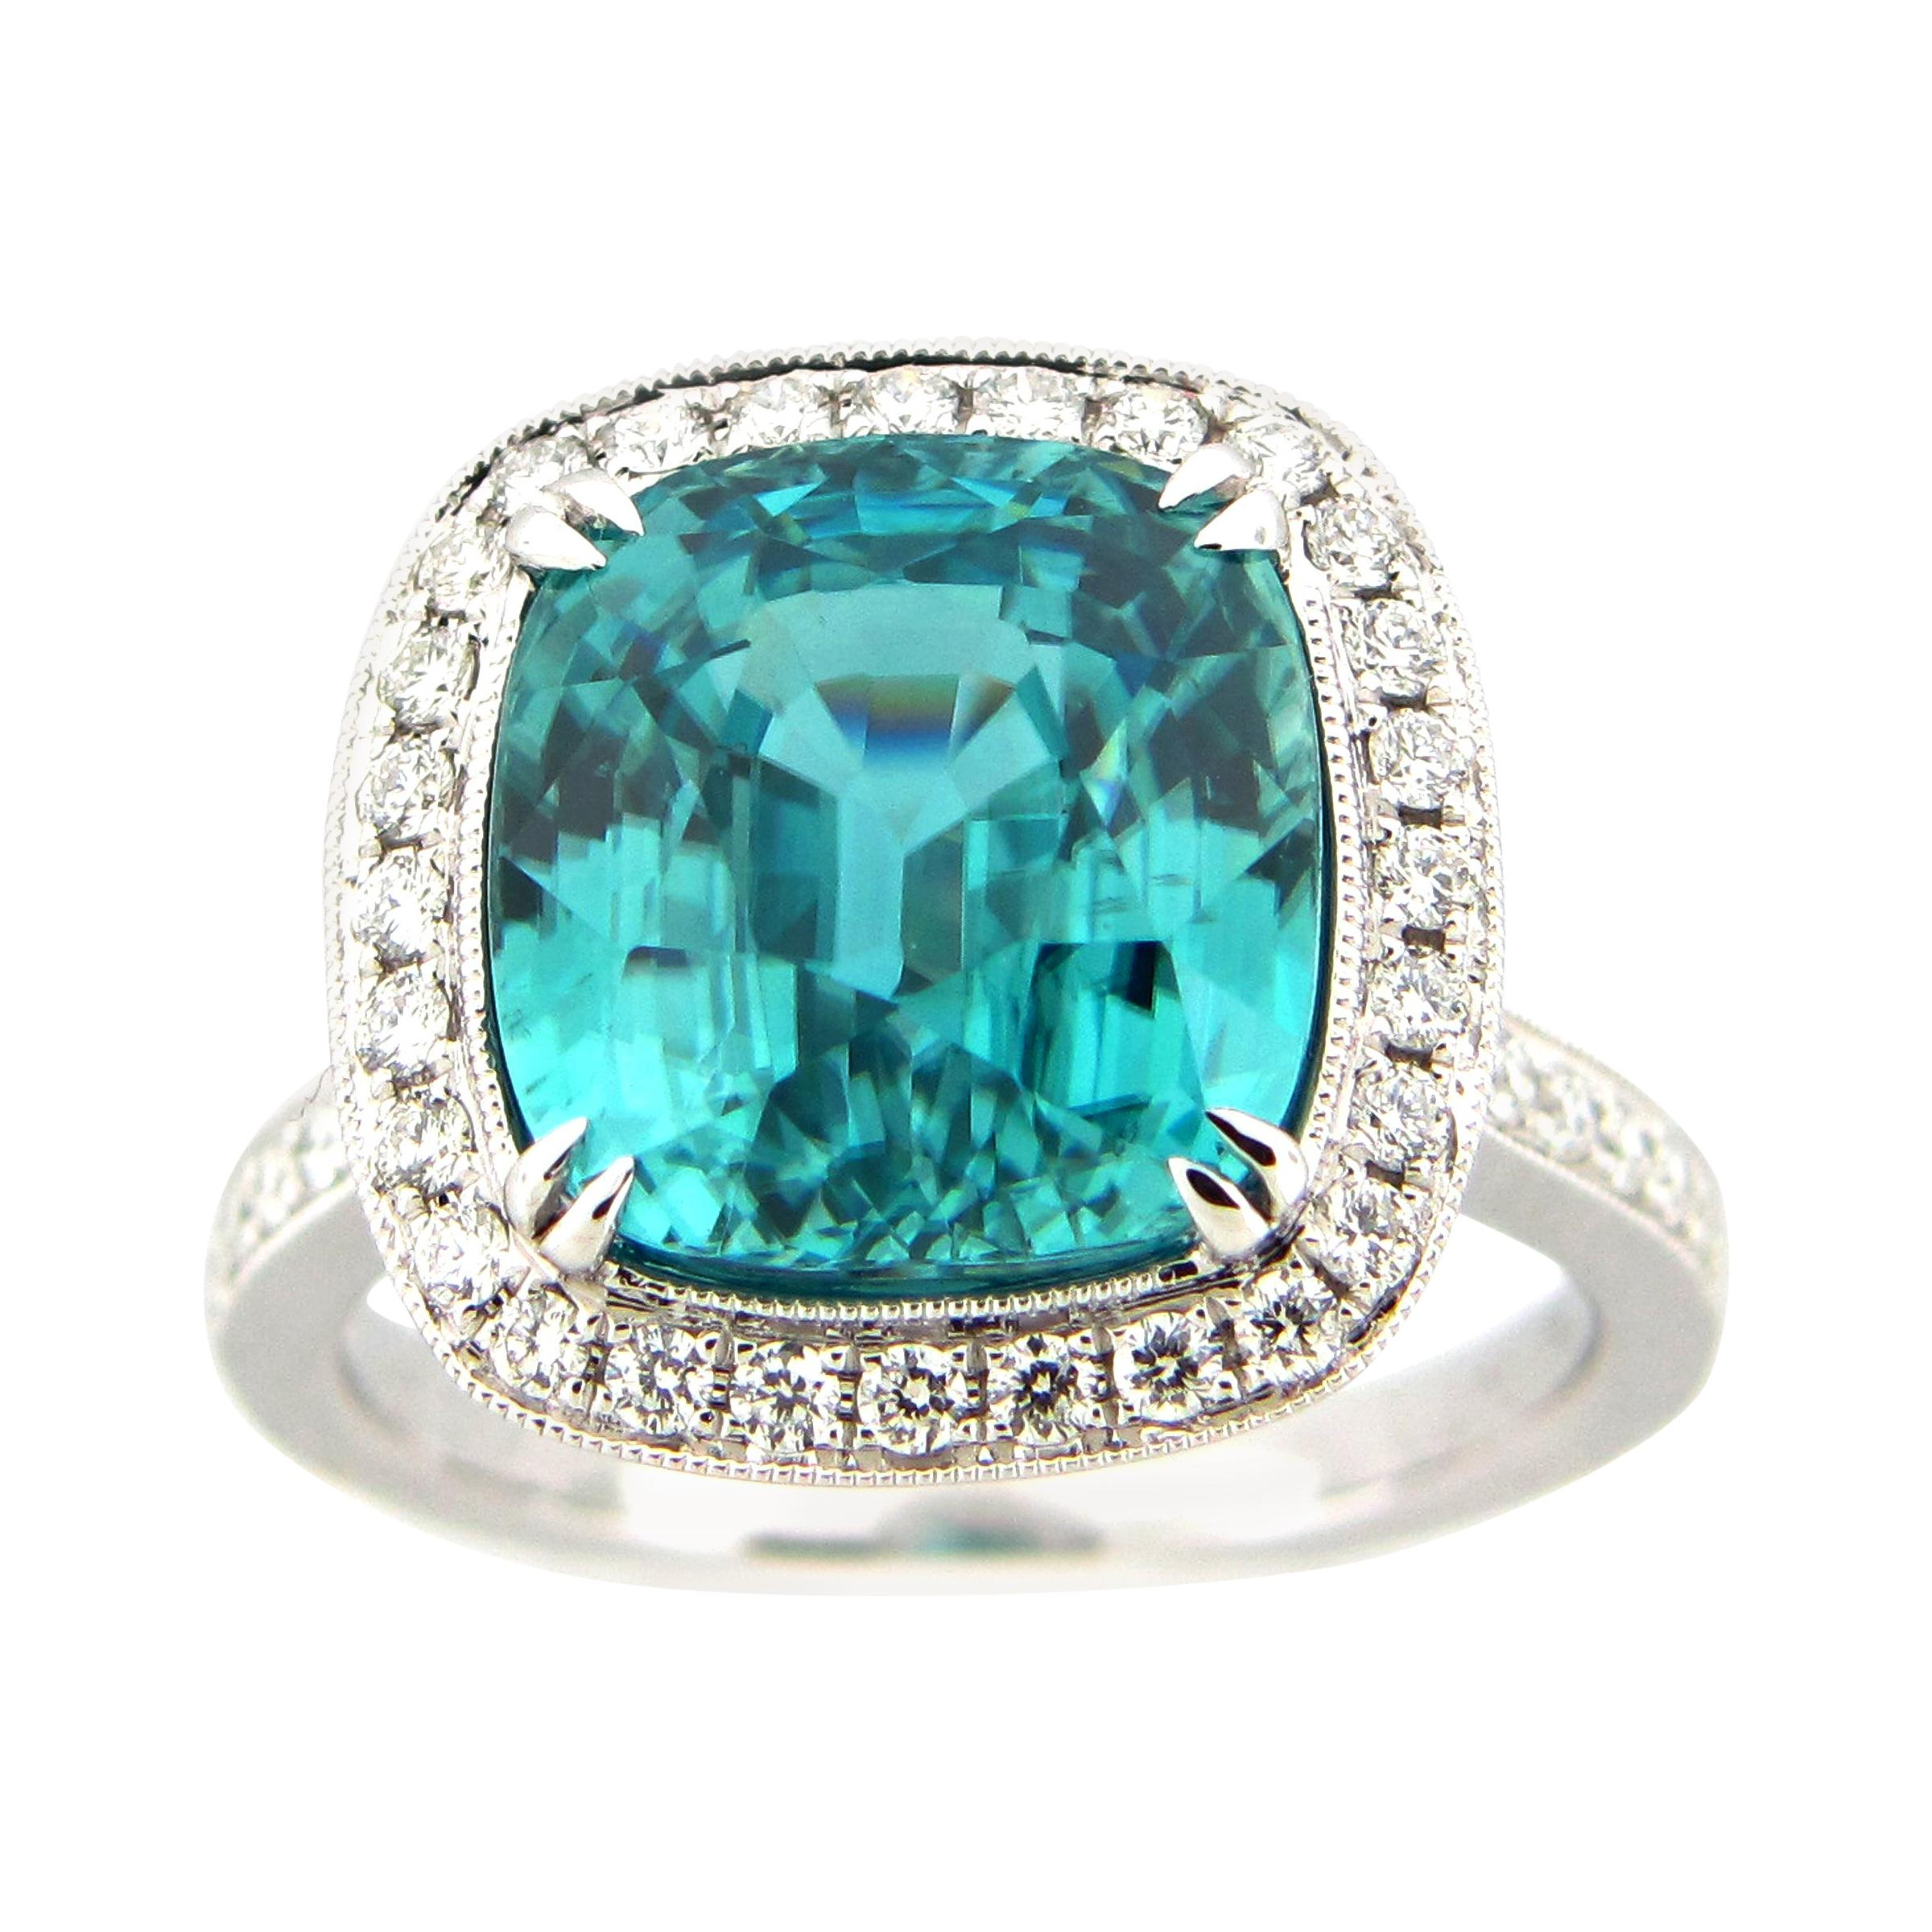 10.50 Carat Blue Zircon and Diamond Cocktail Ring